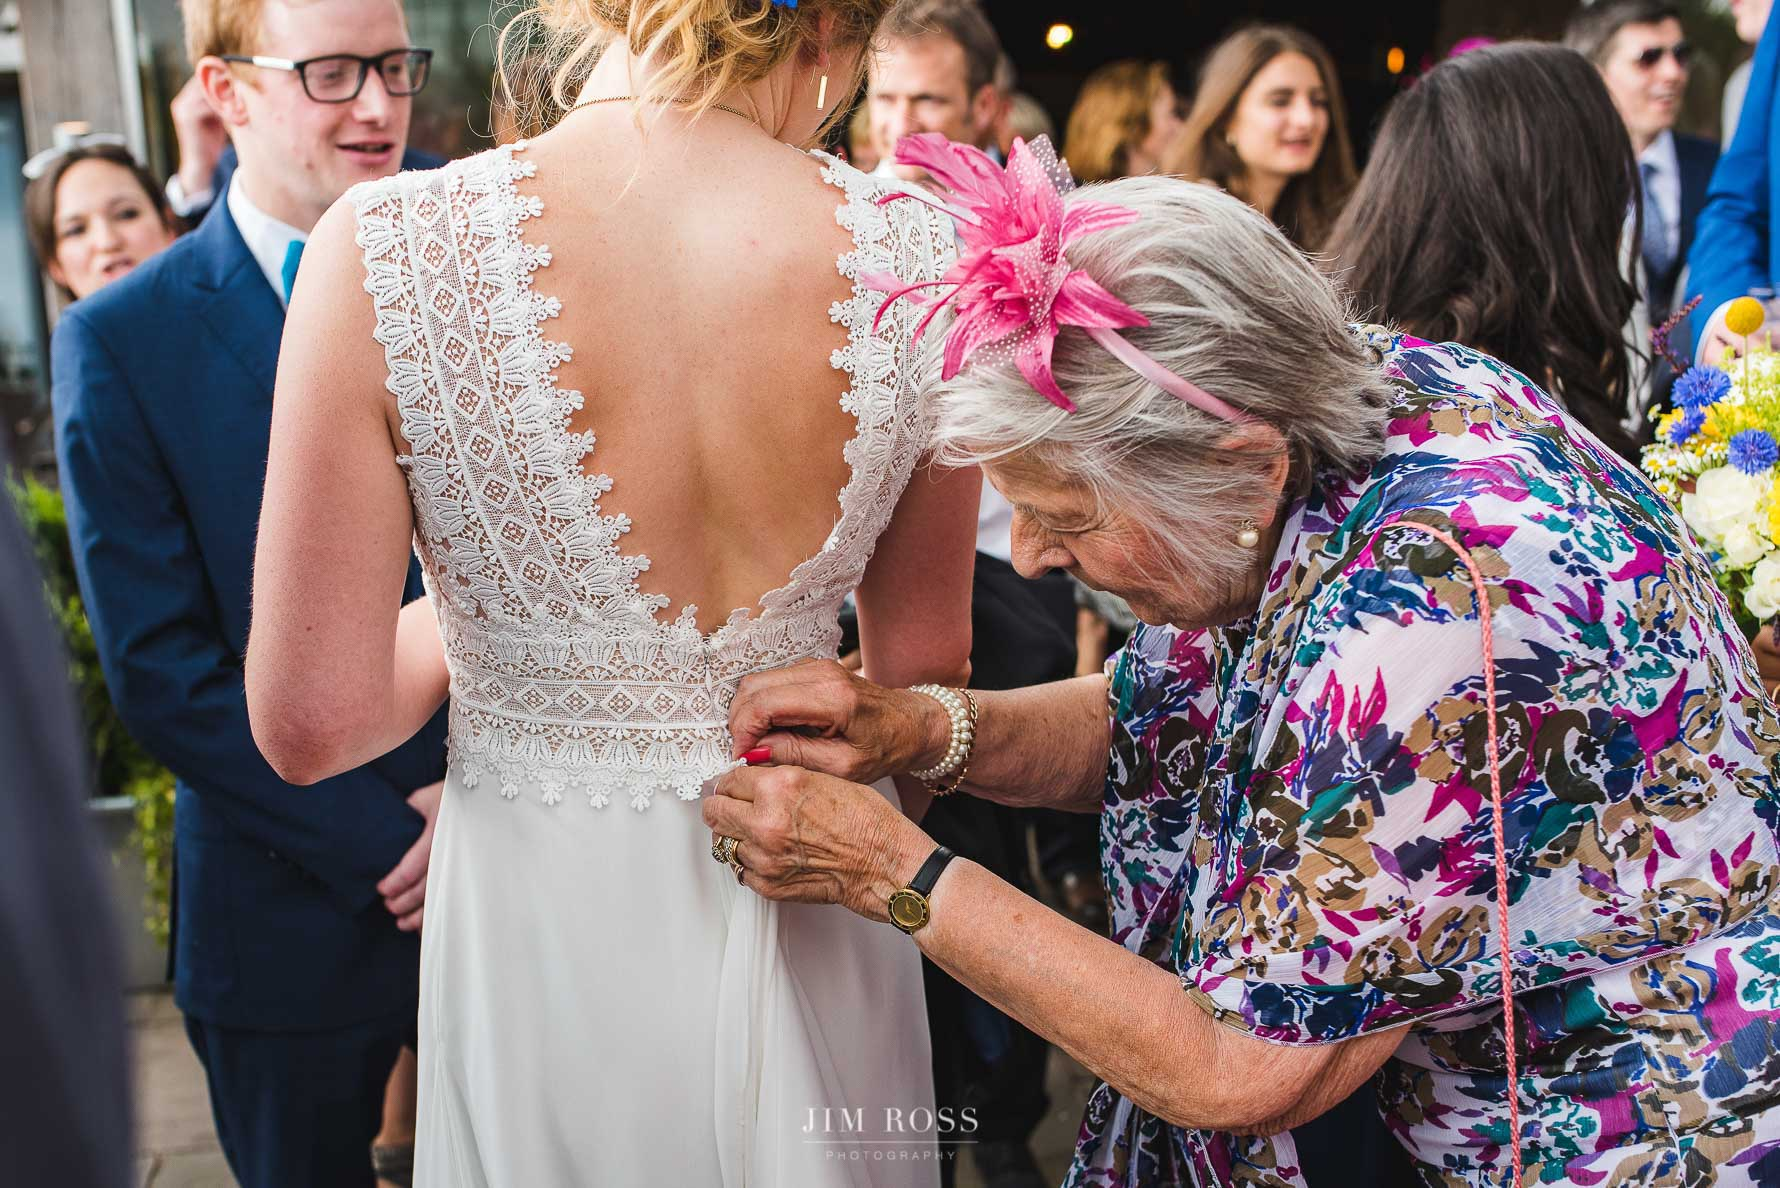 Quick adjustment of elegant bride dress